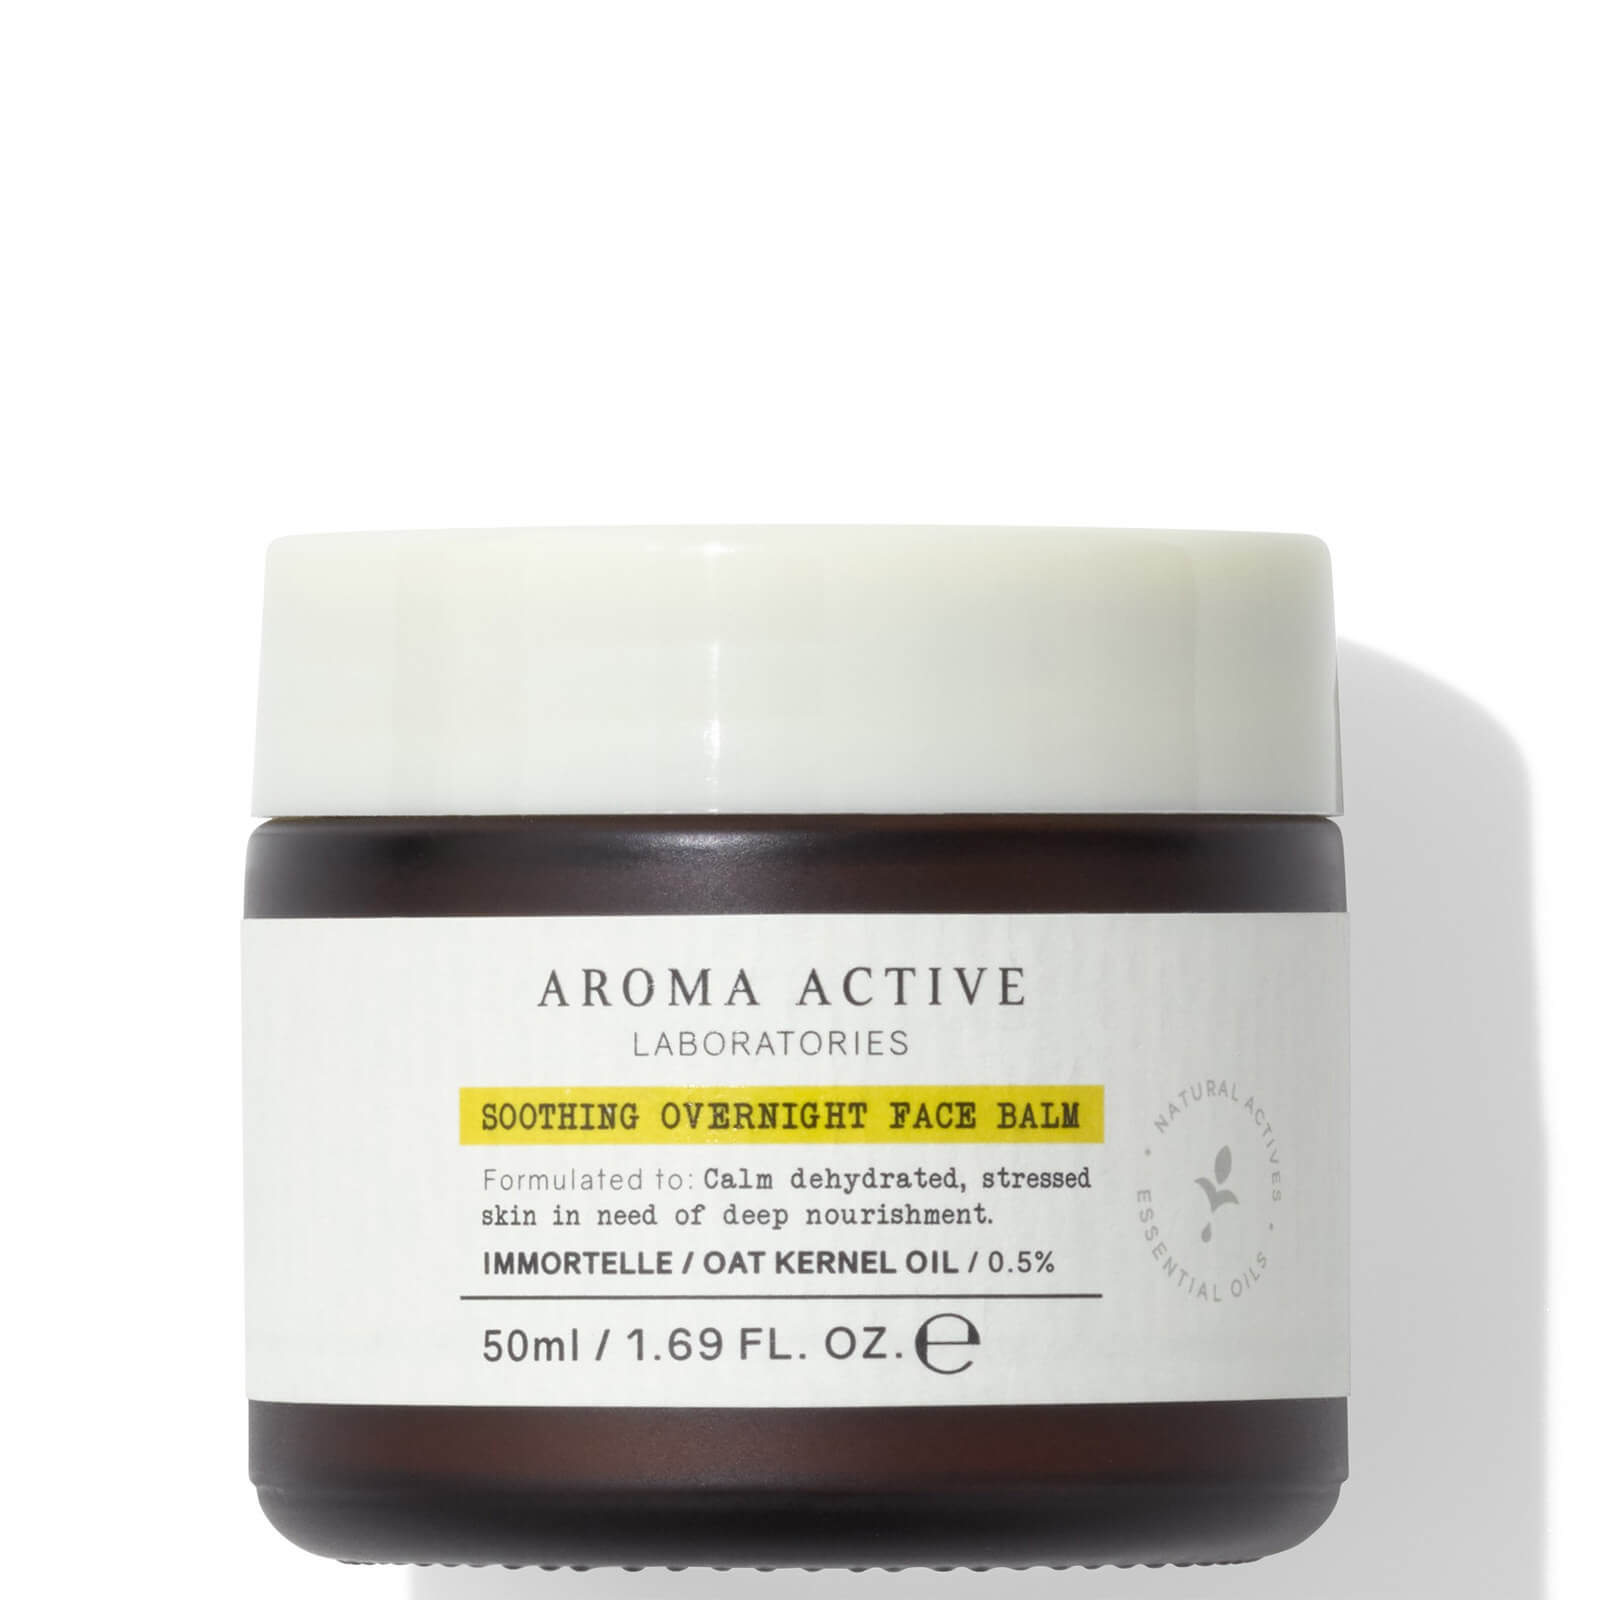 Купить Aroma Active Soothing Overnight Face Balm 50ml